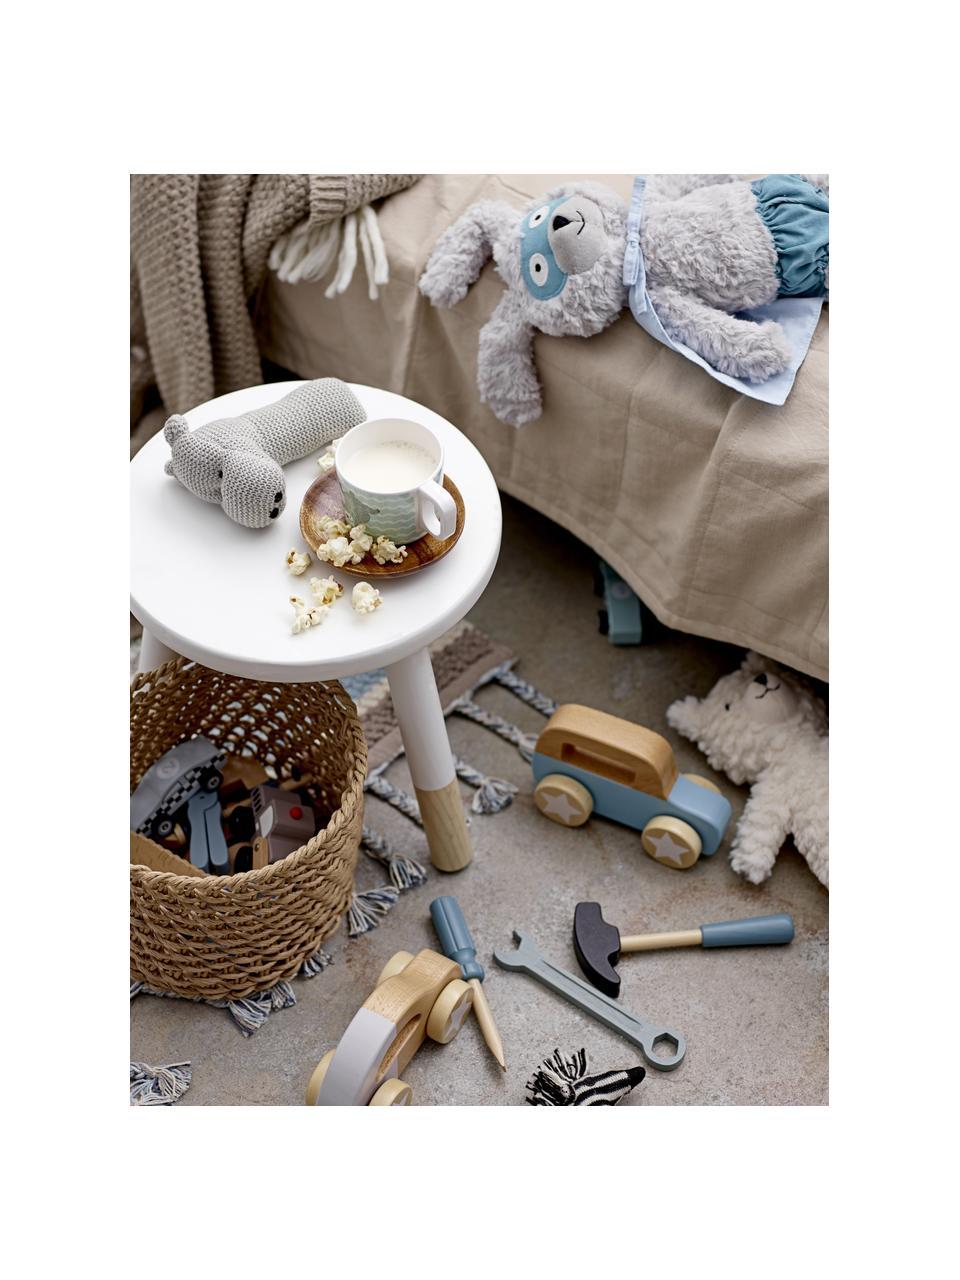 Baby-Strickplaid Tuna aus Wolle, 55% Wolle, 16% Polyester, 15% Acryl,7% Viskose, 7% andere Fasern, Braun, 80 x 100 cm